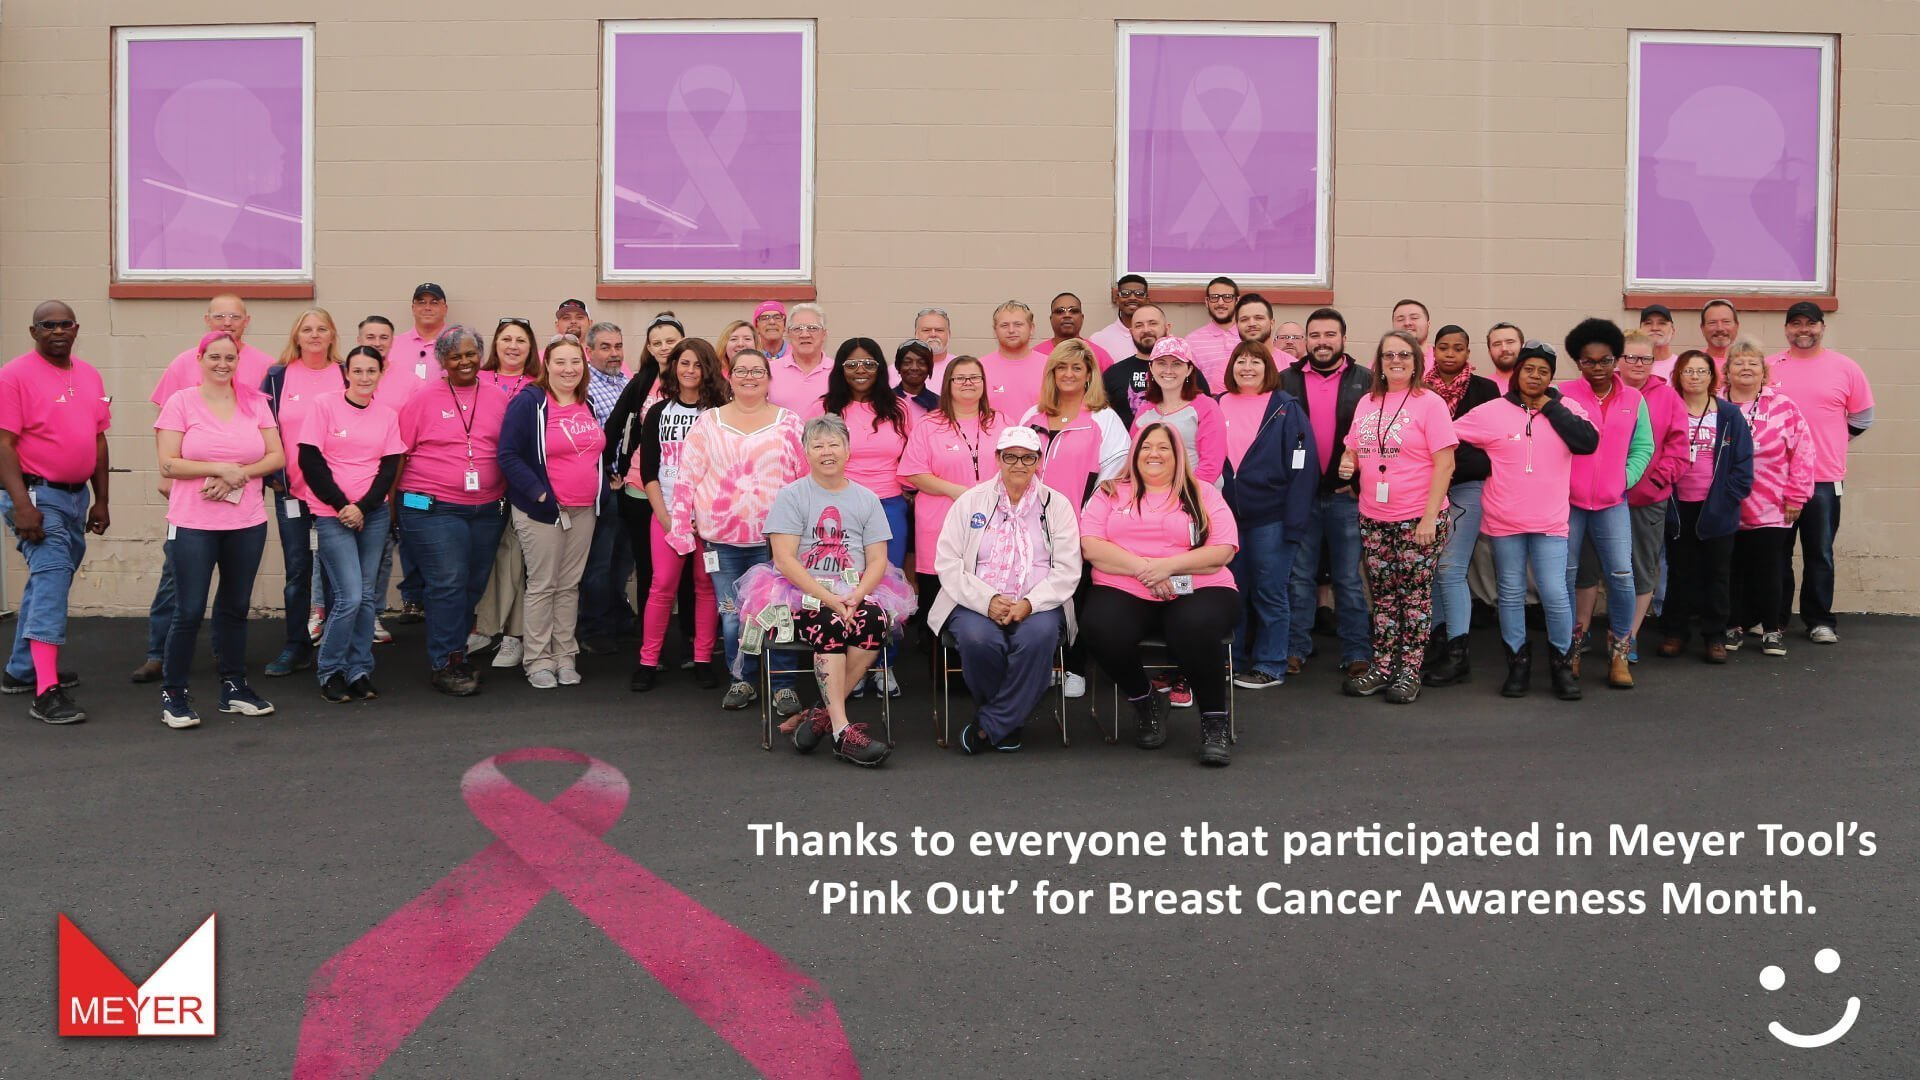 meyer-tool-breast-cancer-awareness-2019